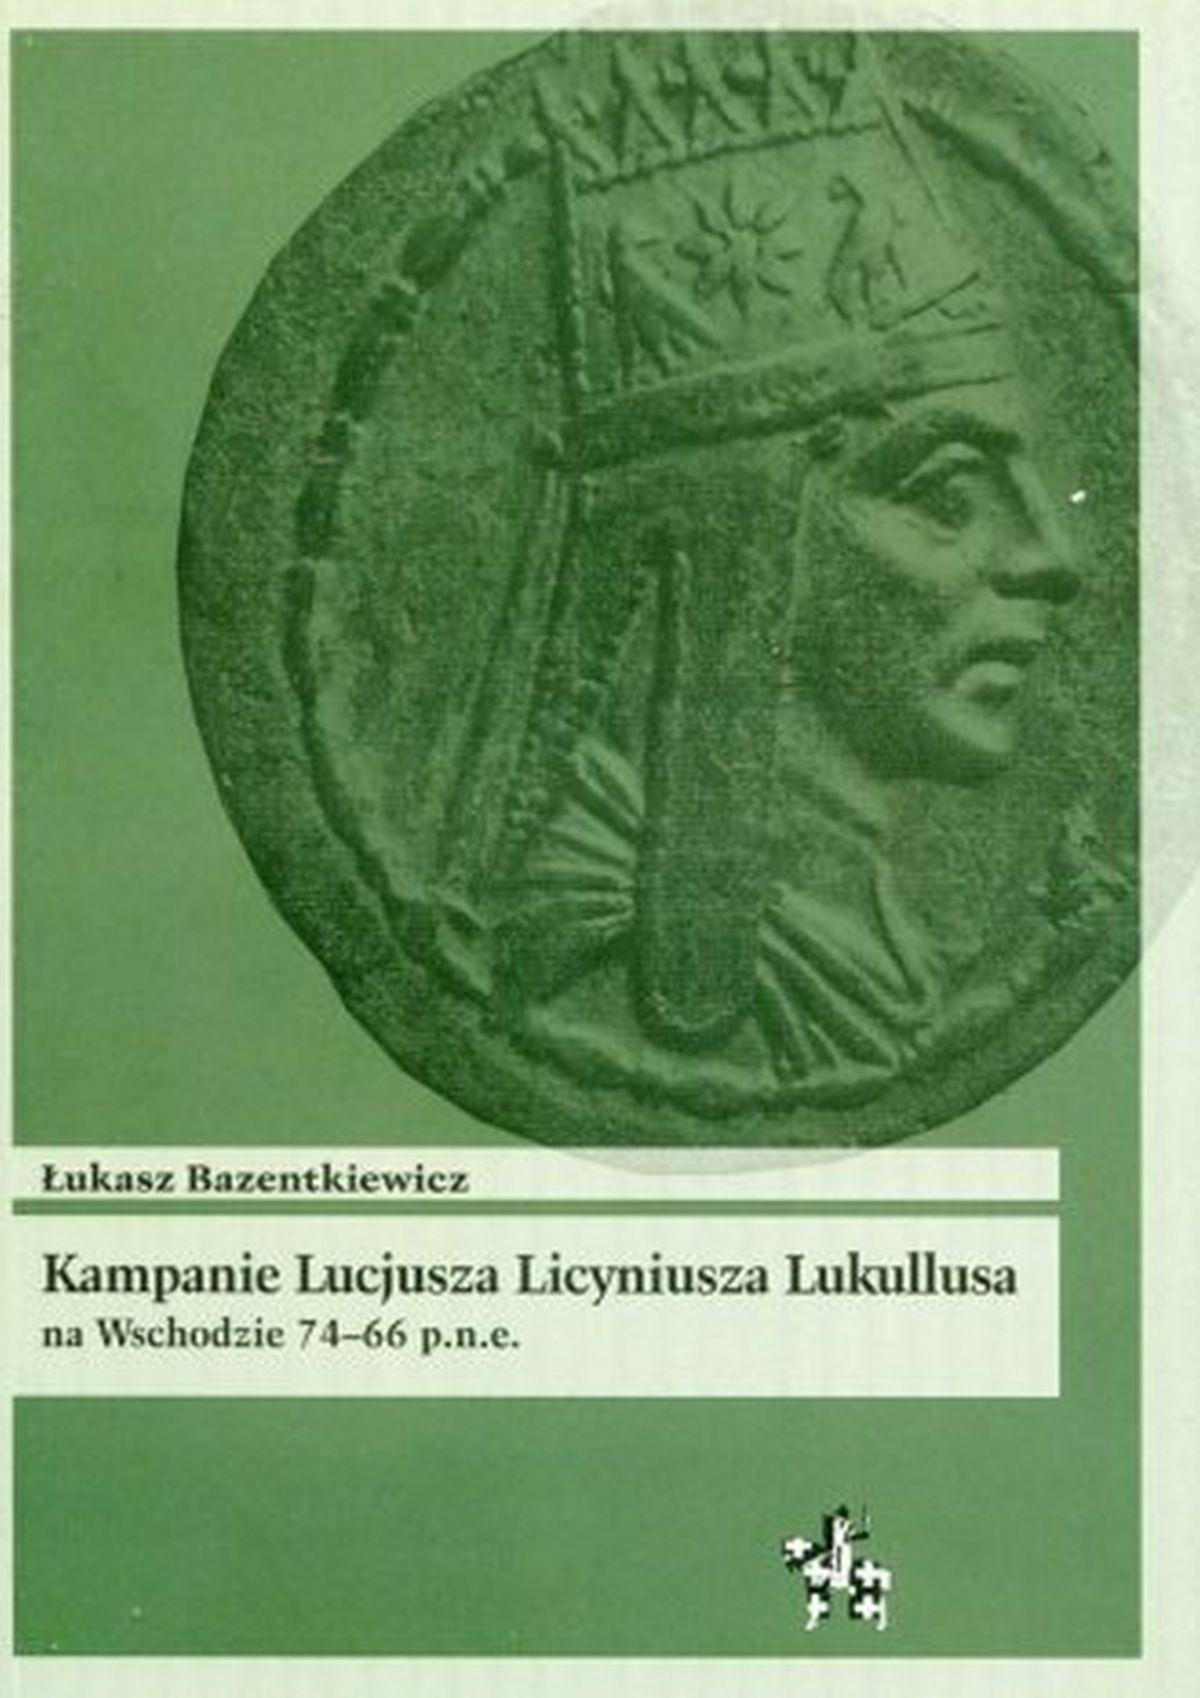 Kampania Lucjusza Licyniusza Lukullusa